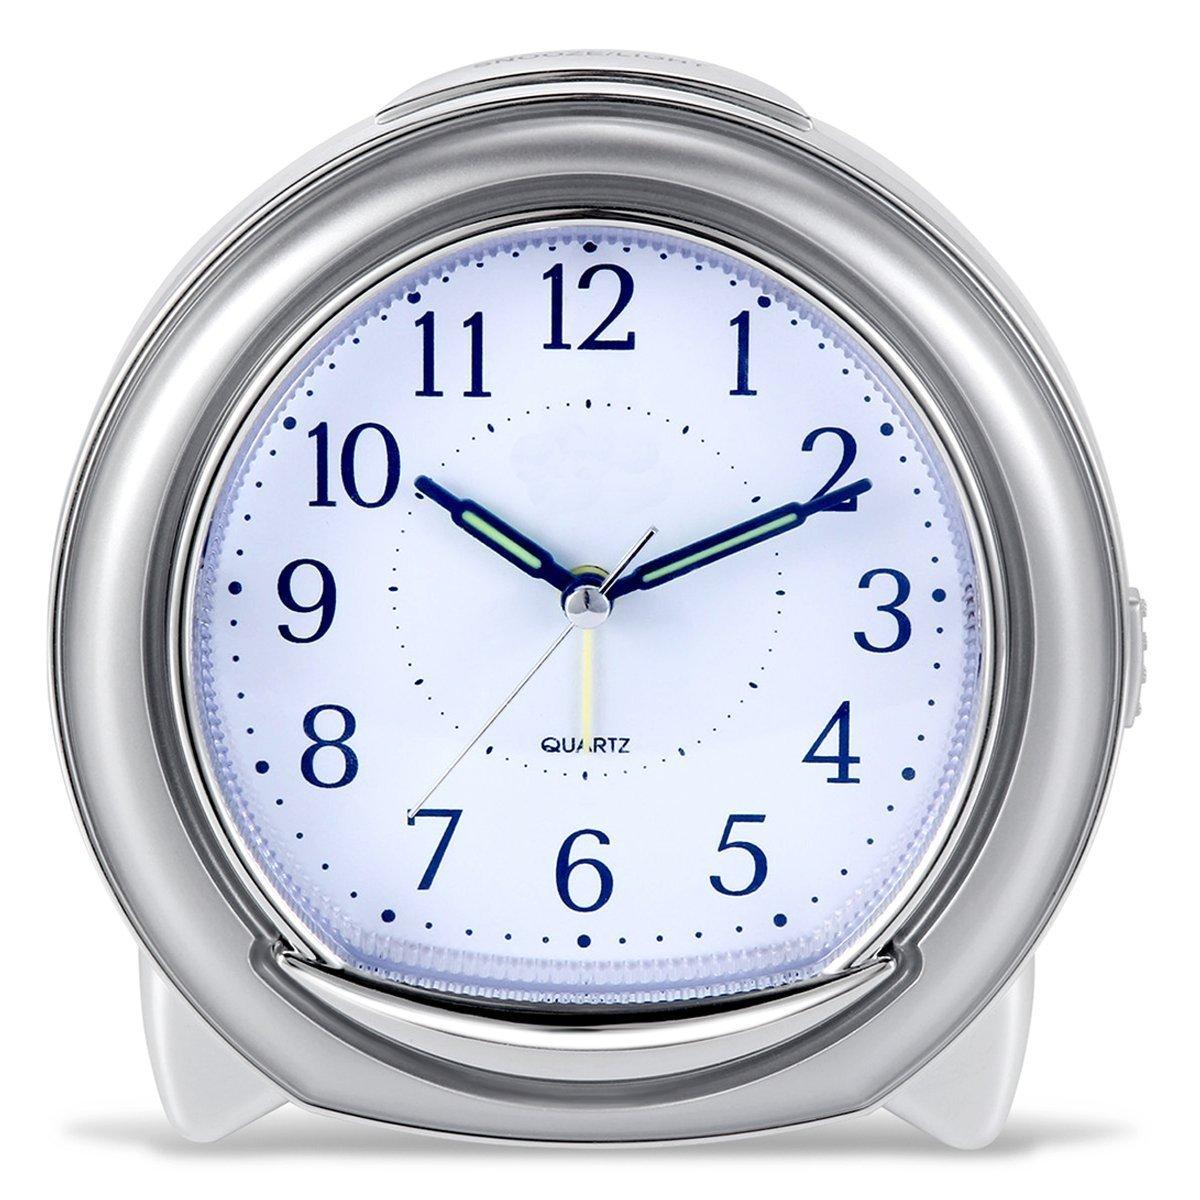 Super Silent Desk Alarm Clock, BonyTek Quartz Alarm Clock with Loud Mechanical Bell Birdsong Melody Alarm, Nightlight, Snooze, Silent Sweep Seconds, Luminous Hands, Battery Powered (Silver)